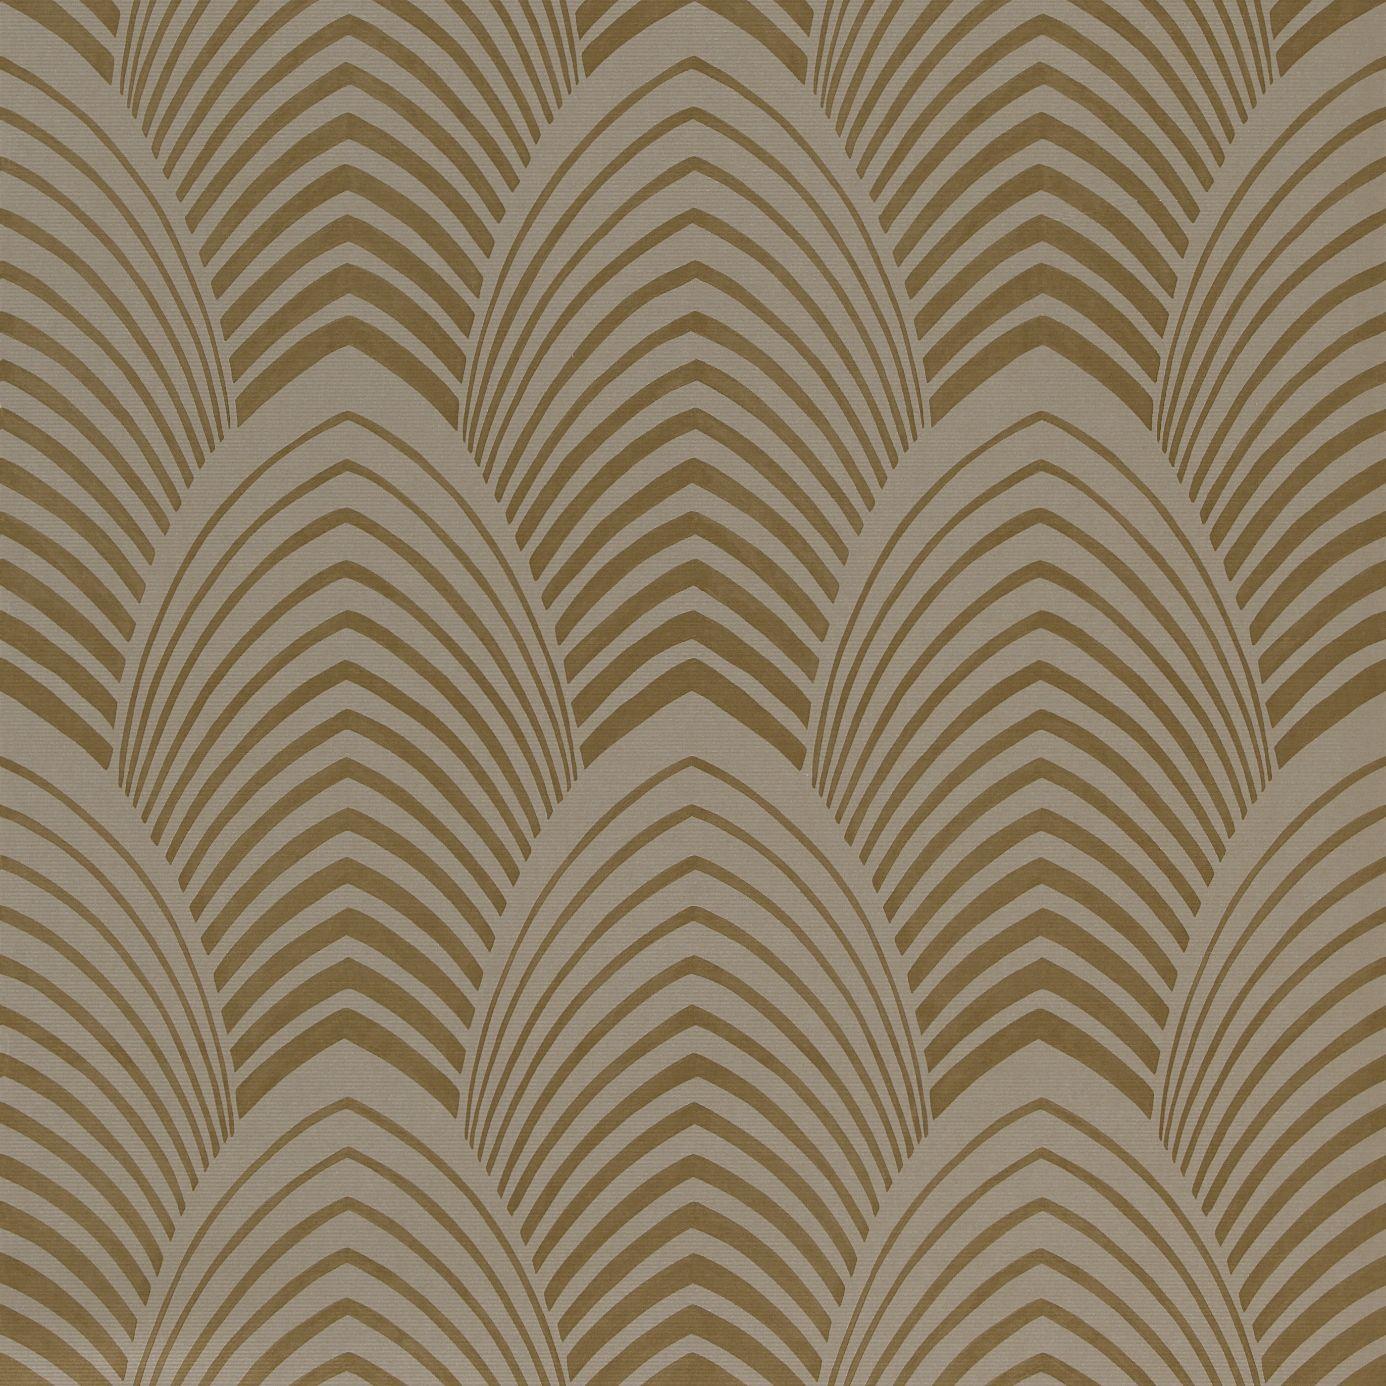 Deco Wallpaper Akrona Wallpaper Collection Harlequin Wallpaper 1386x1386